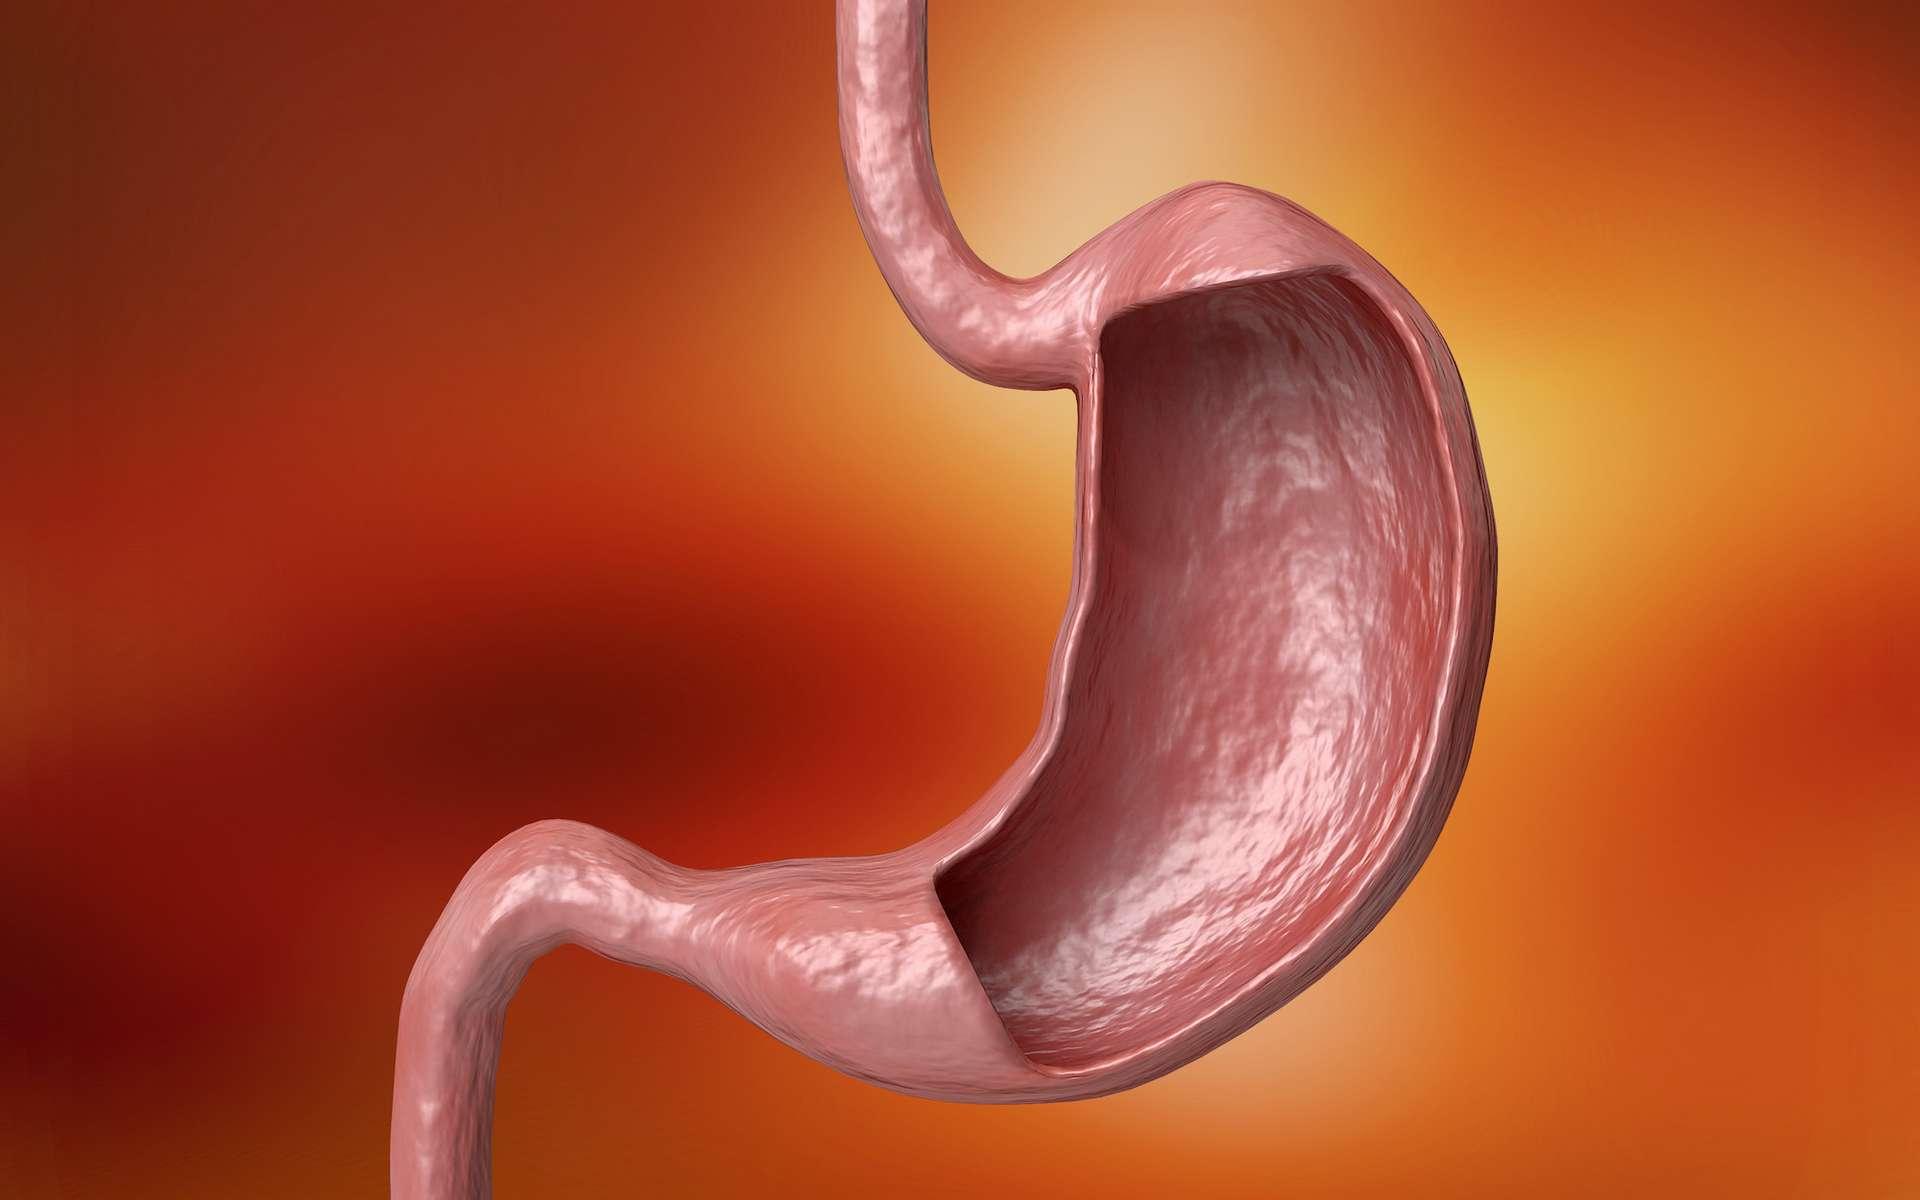 Le cancer de l'estomac est la principale indication de la gastrectomie. © AGPhotography, Adobe Stock